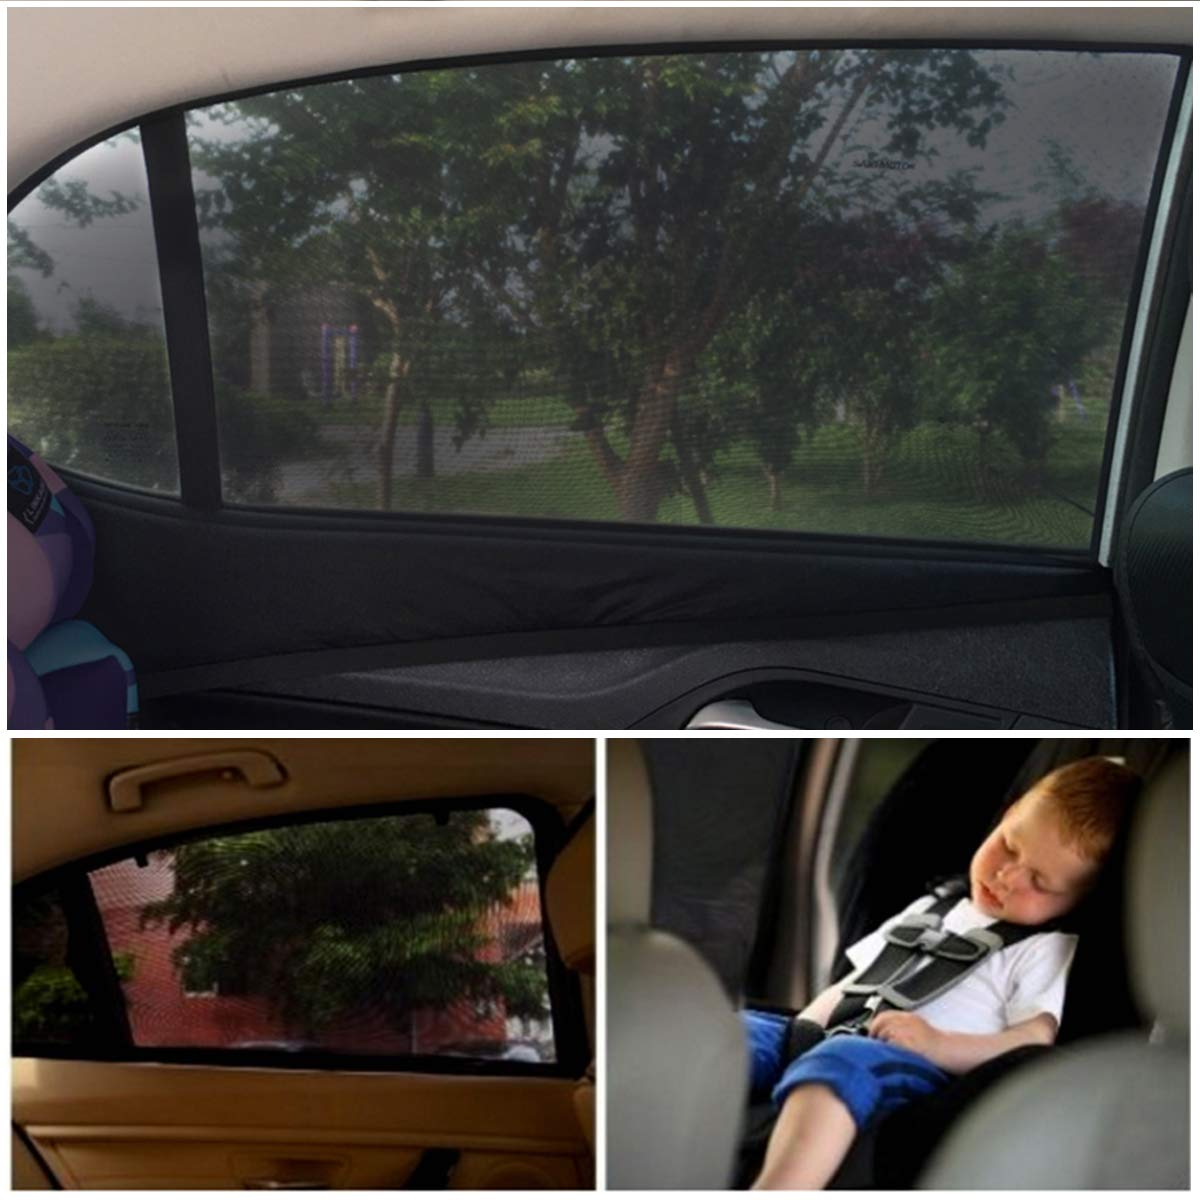 QJKJ 2 pieces Stroller sunshade Child protection baby adult pet Black,120 * 50cm L portable car sunshade accessories window sunshade block UV anti-mosquito dustproof